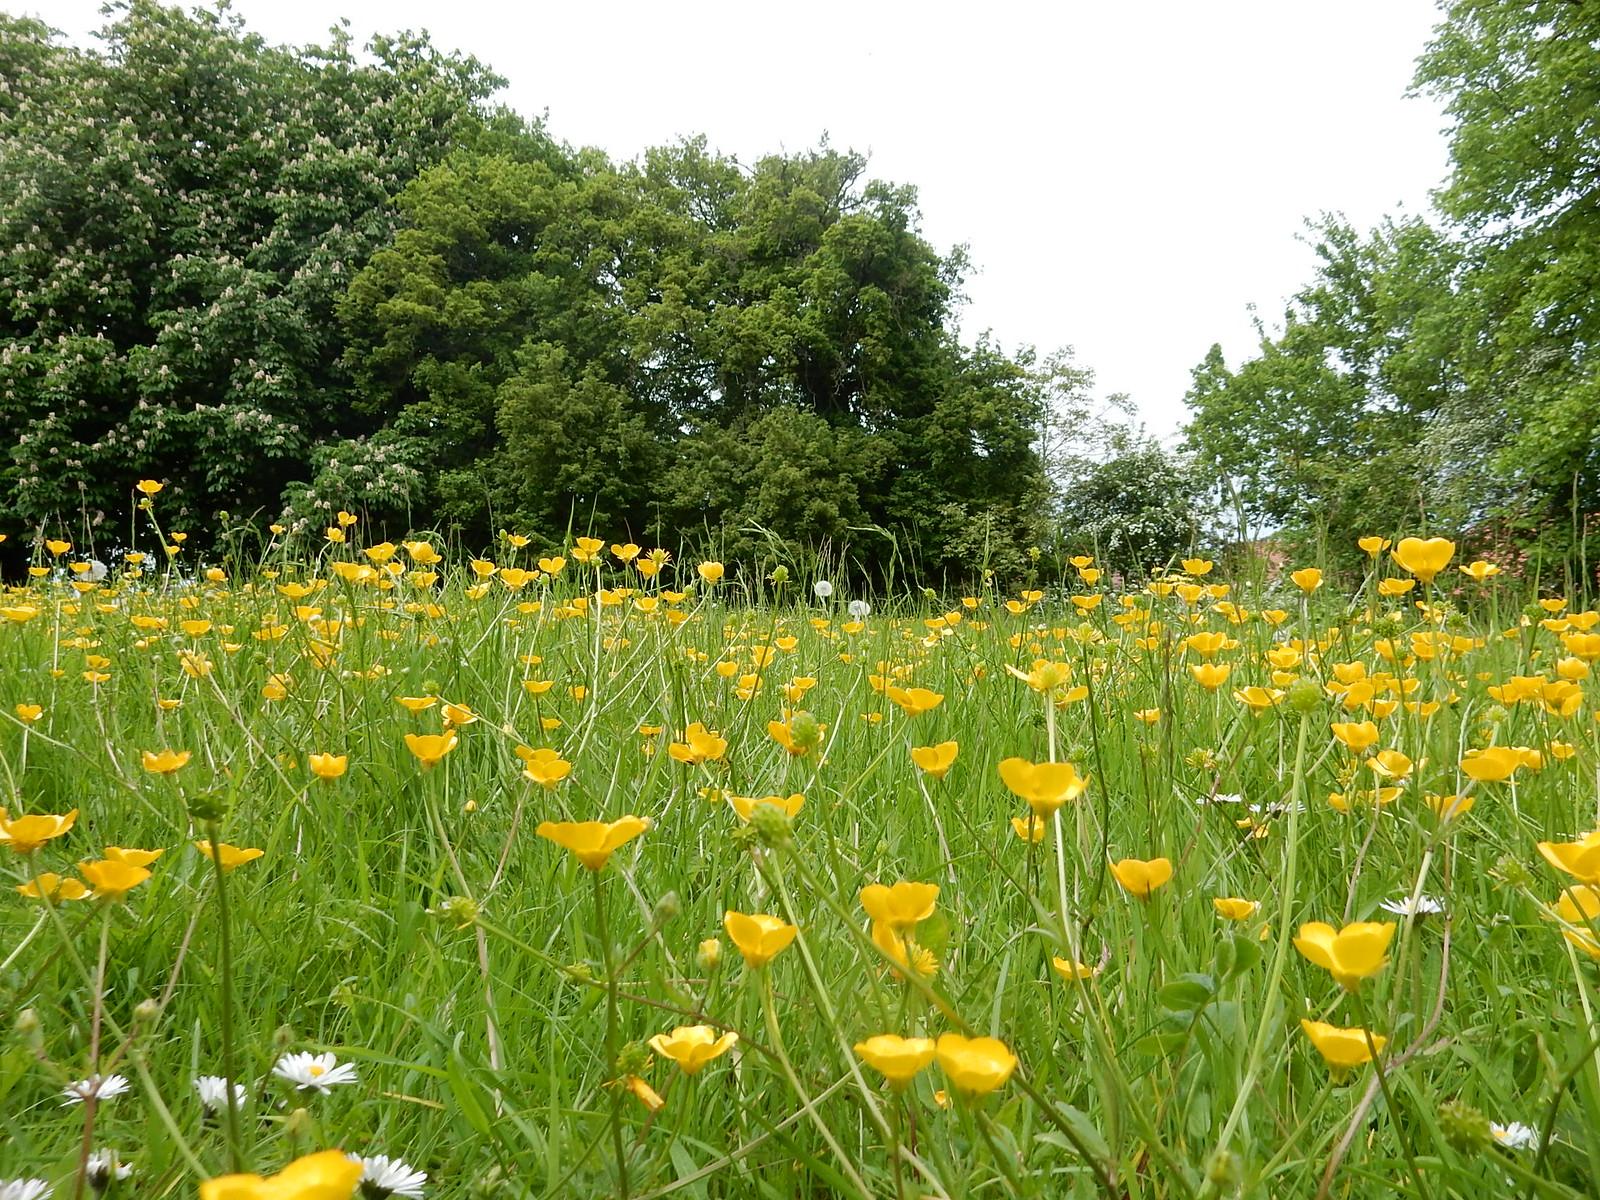 Great Henny churchyard Bures to Sudbury